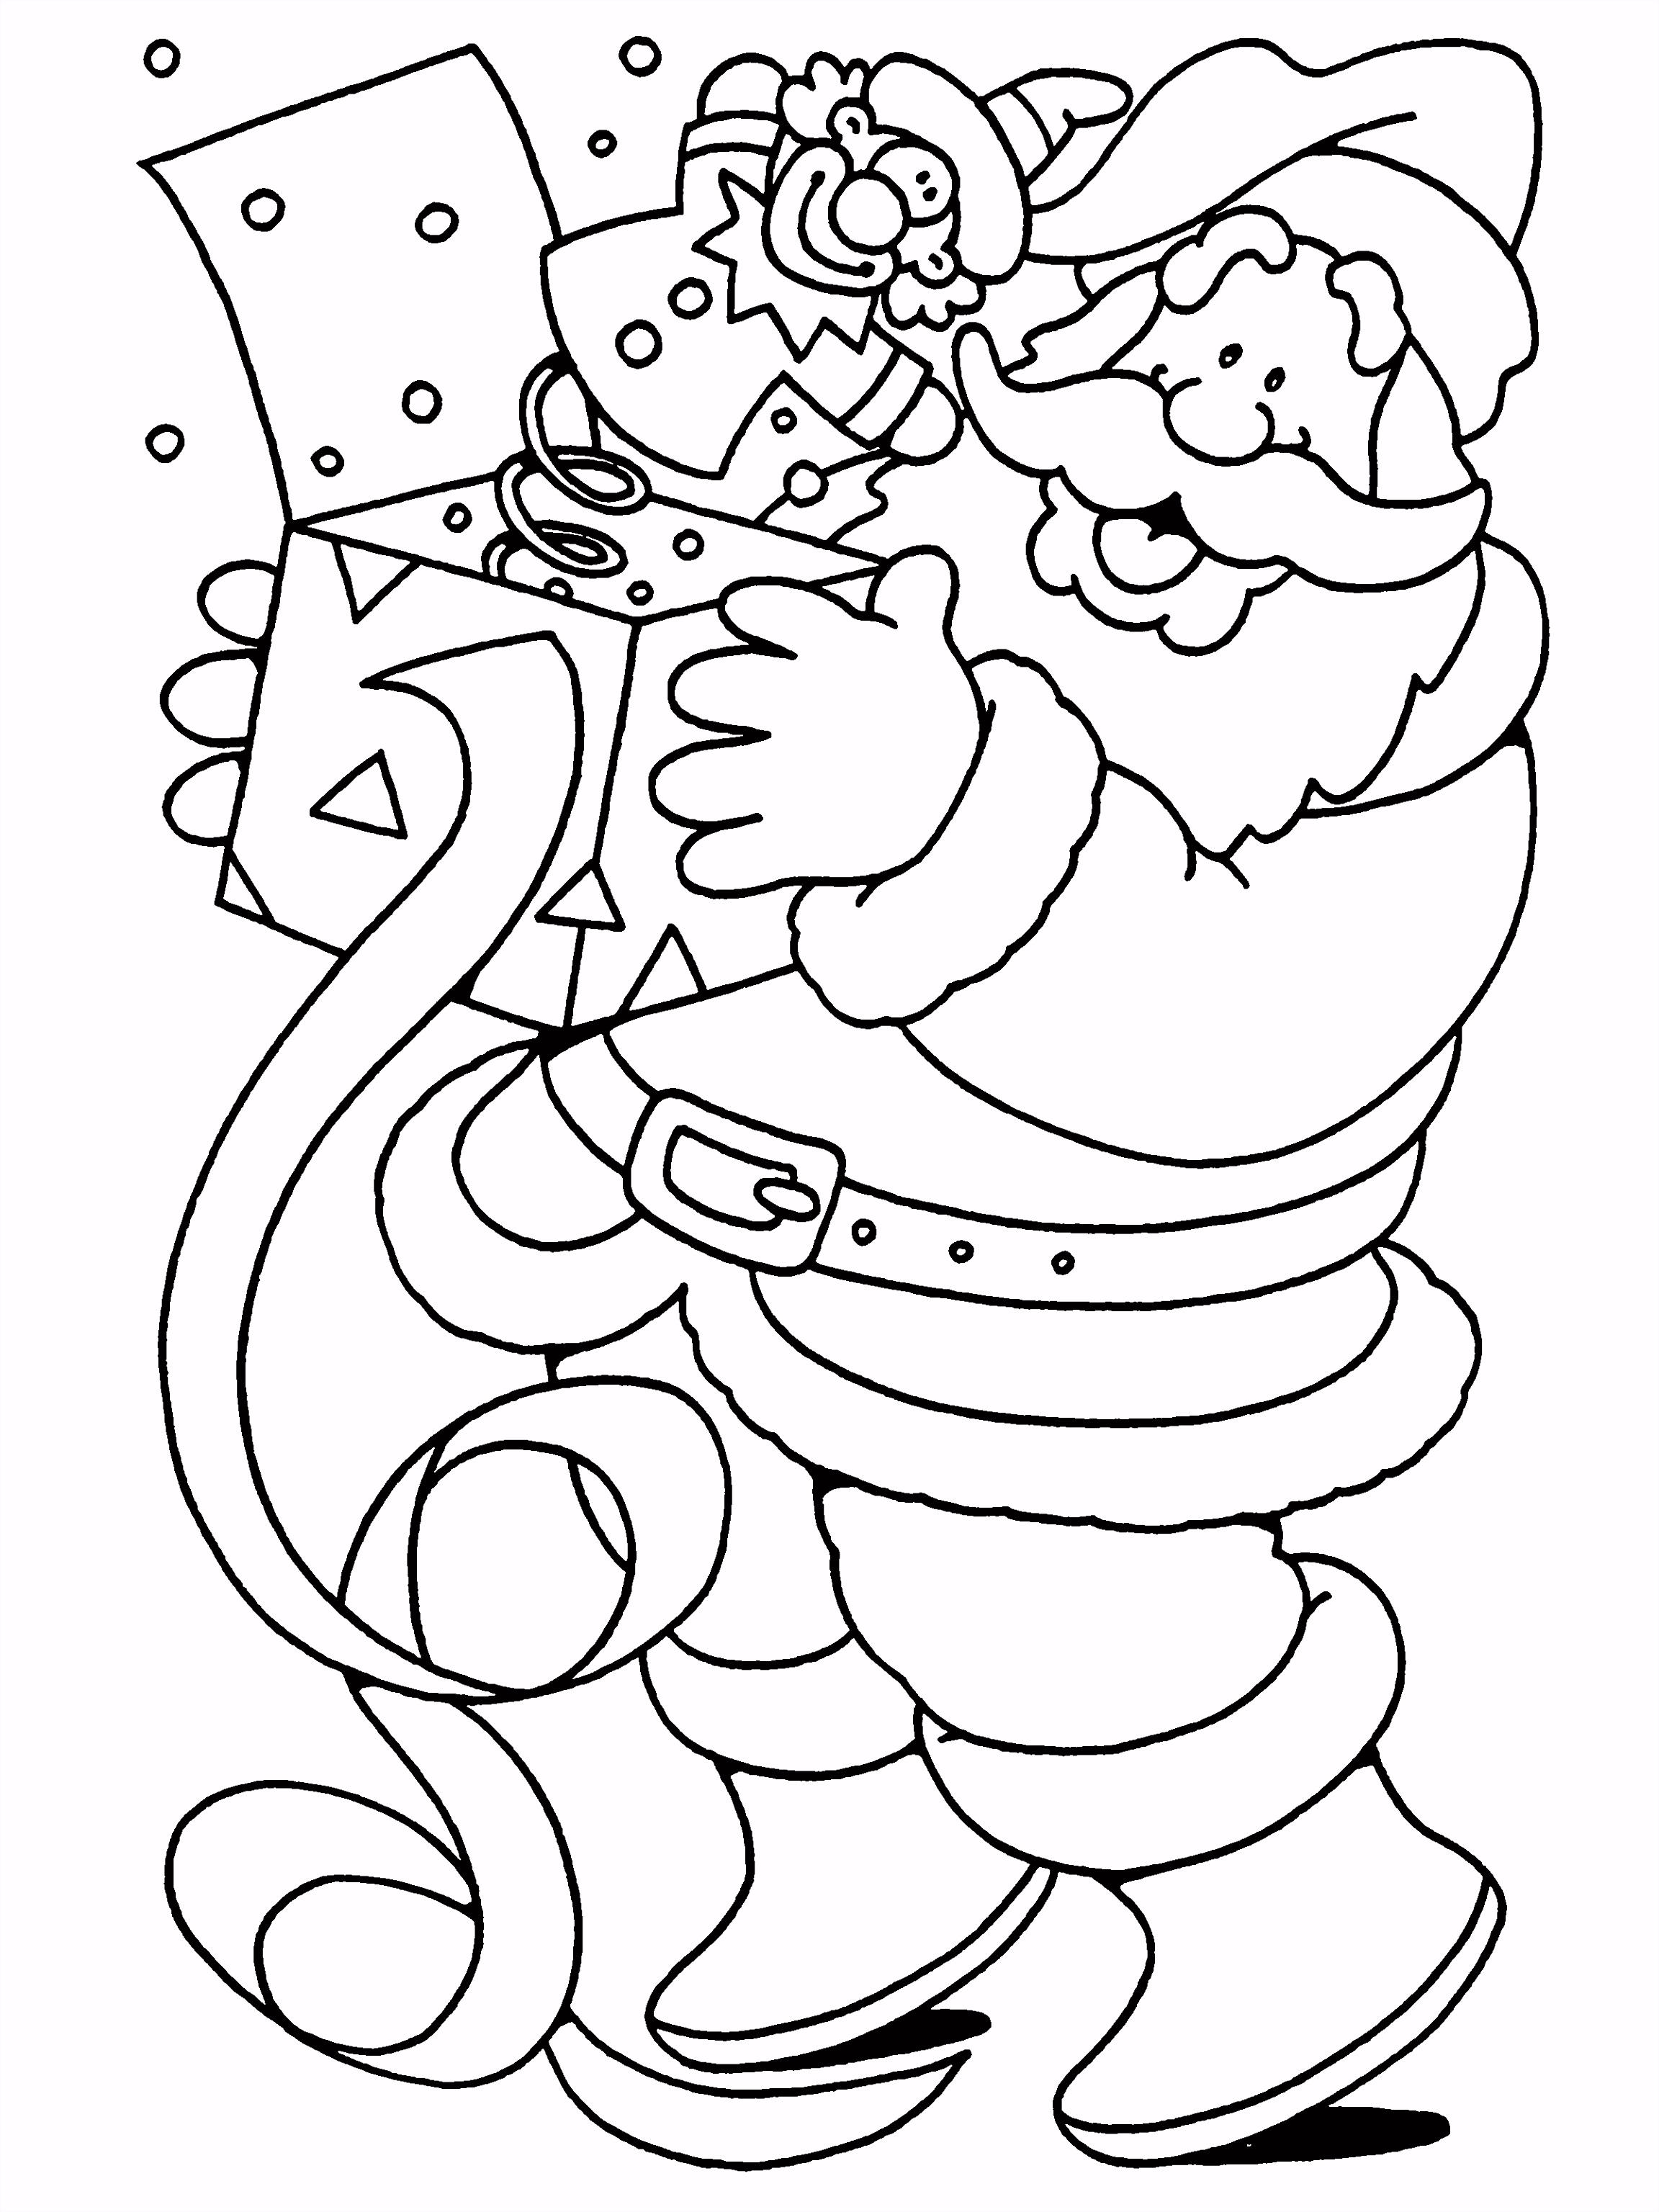 Kleurplaten Paradijs Kleurboek Kerstmis